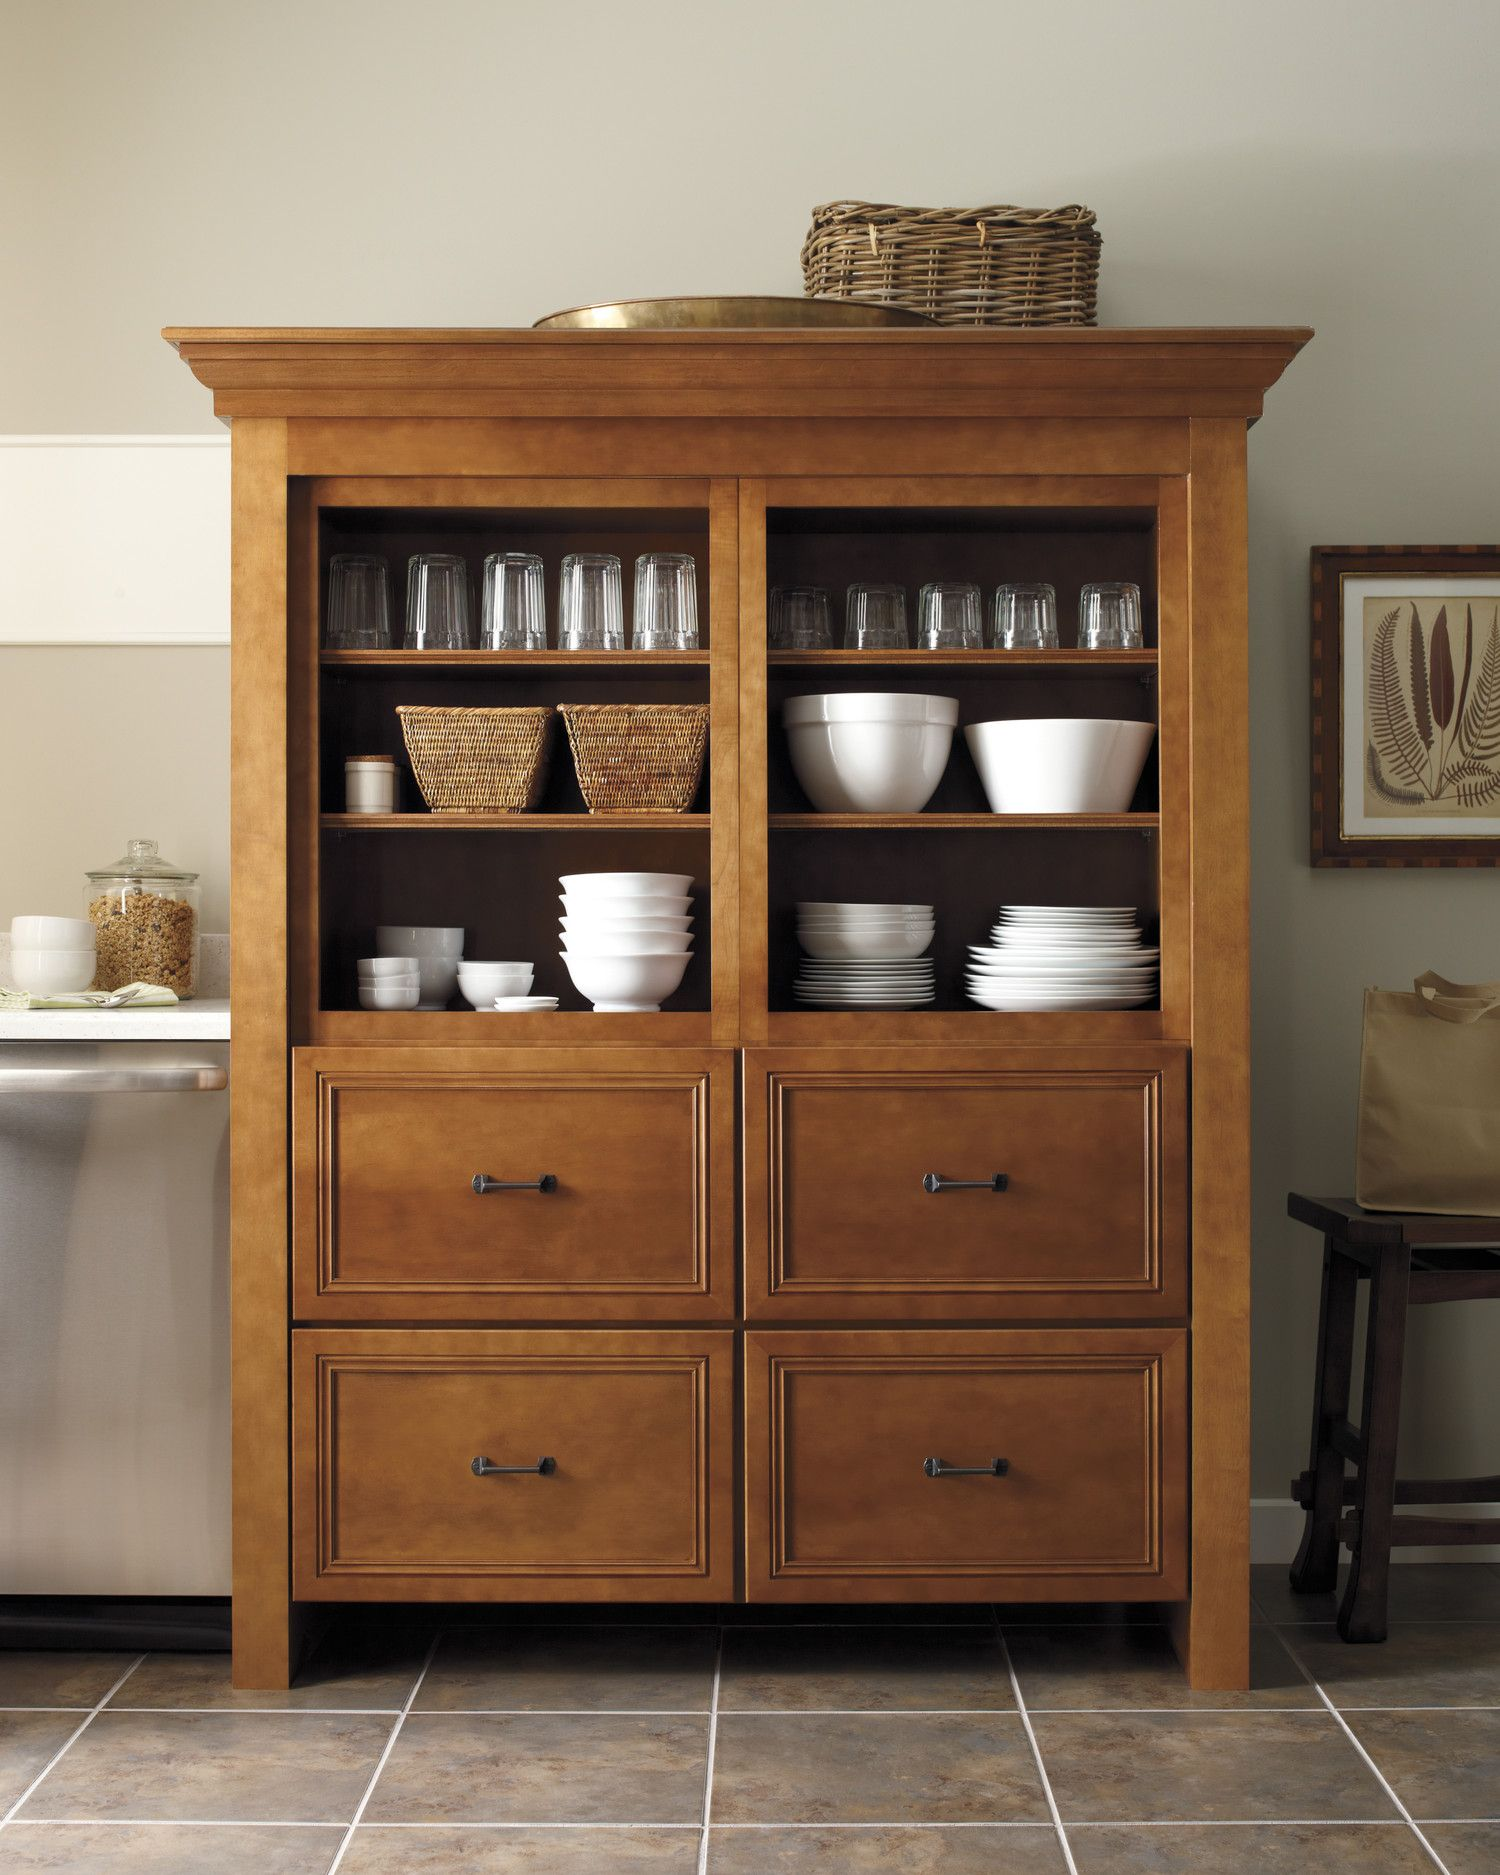 Living Kitchen Designs From The Home Depot Freestanding Kitchen Free Standing Kitchen Cabinets Martha Stewart Kitchen